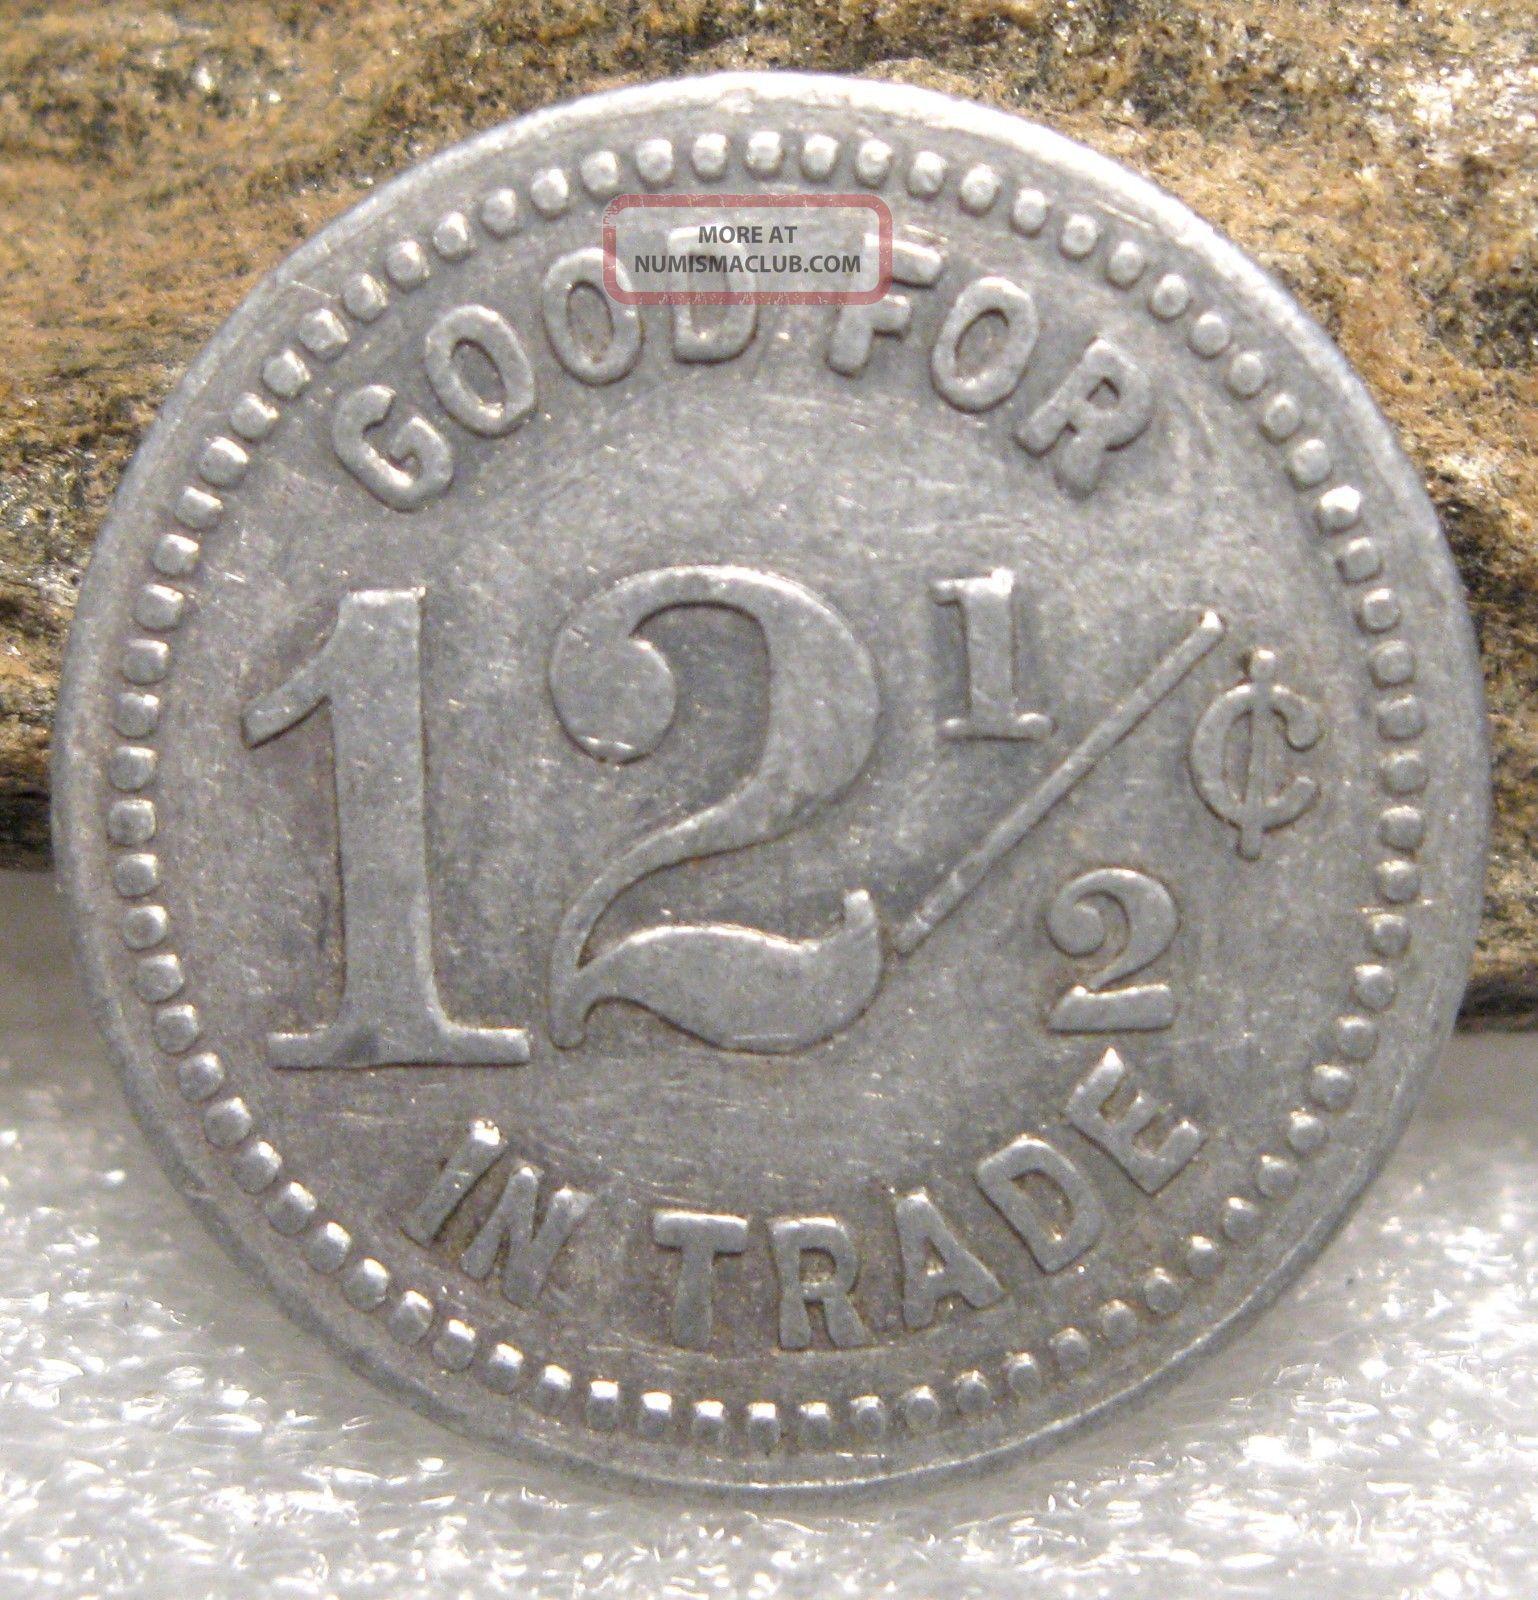 Vintage 12 1/2 Cents Trade Token Sacajawea Club Good For Token Coin Exonumia photo